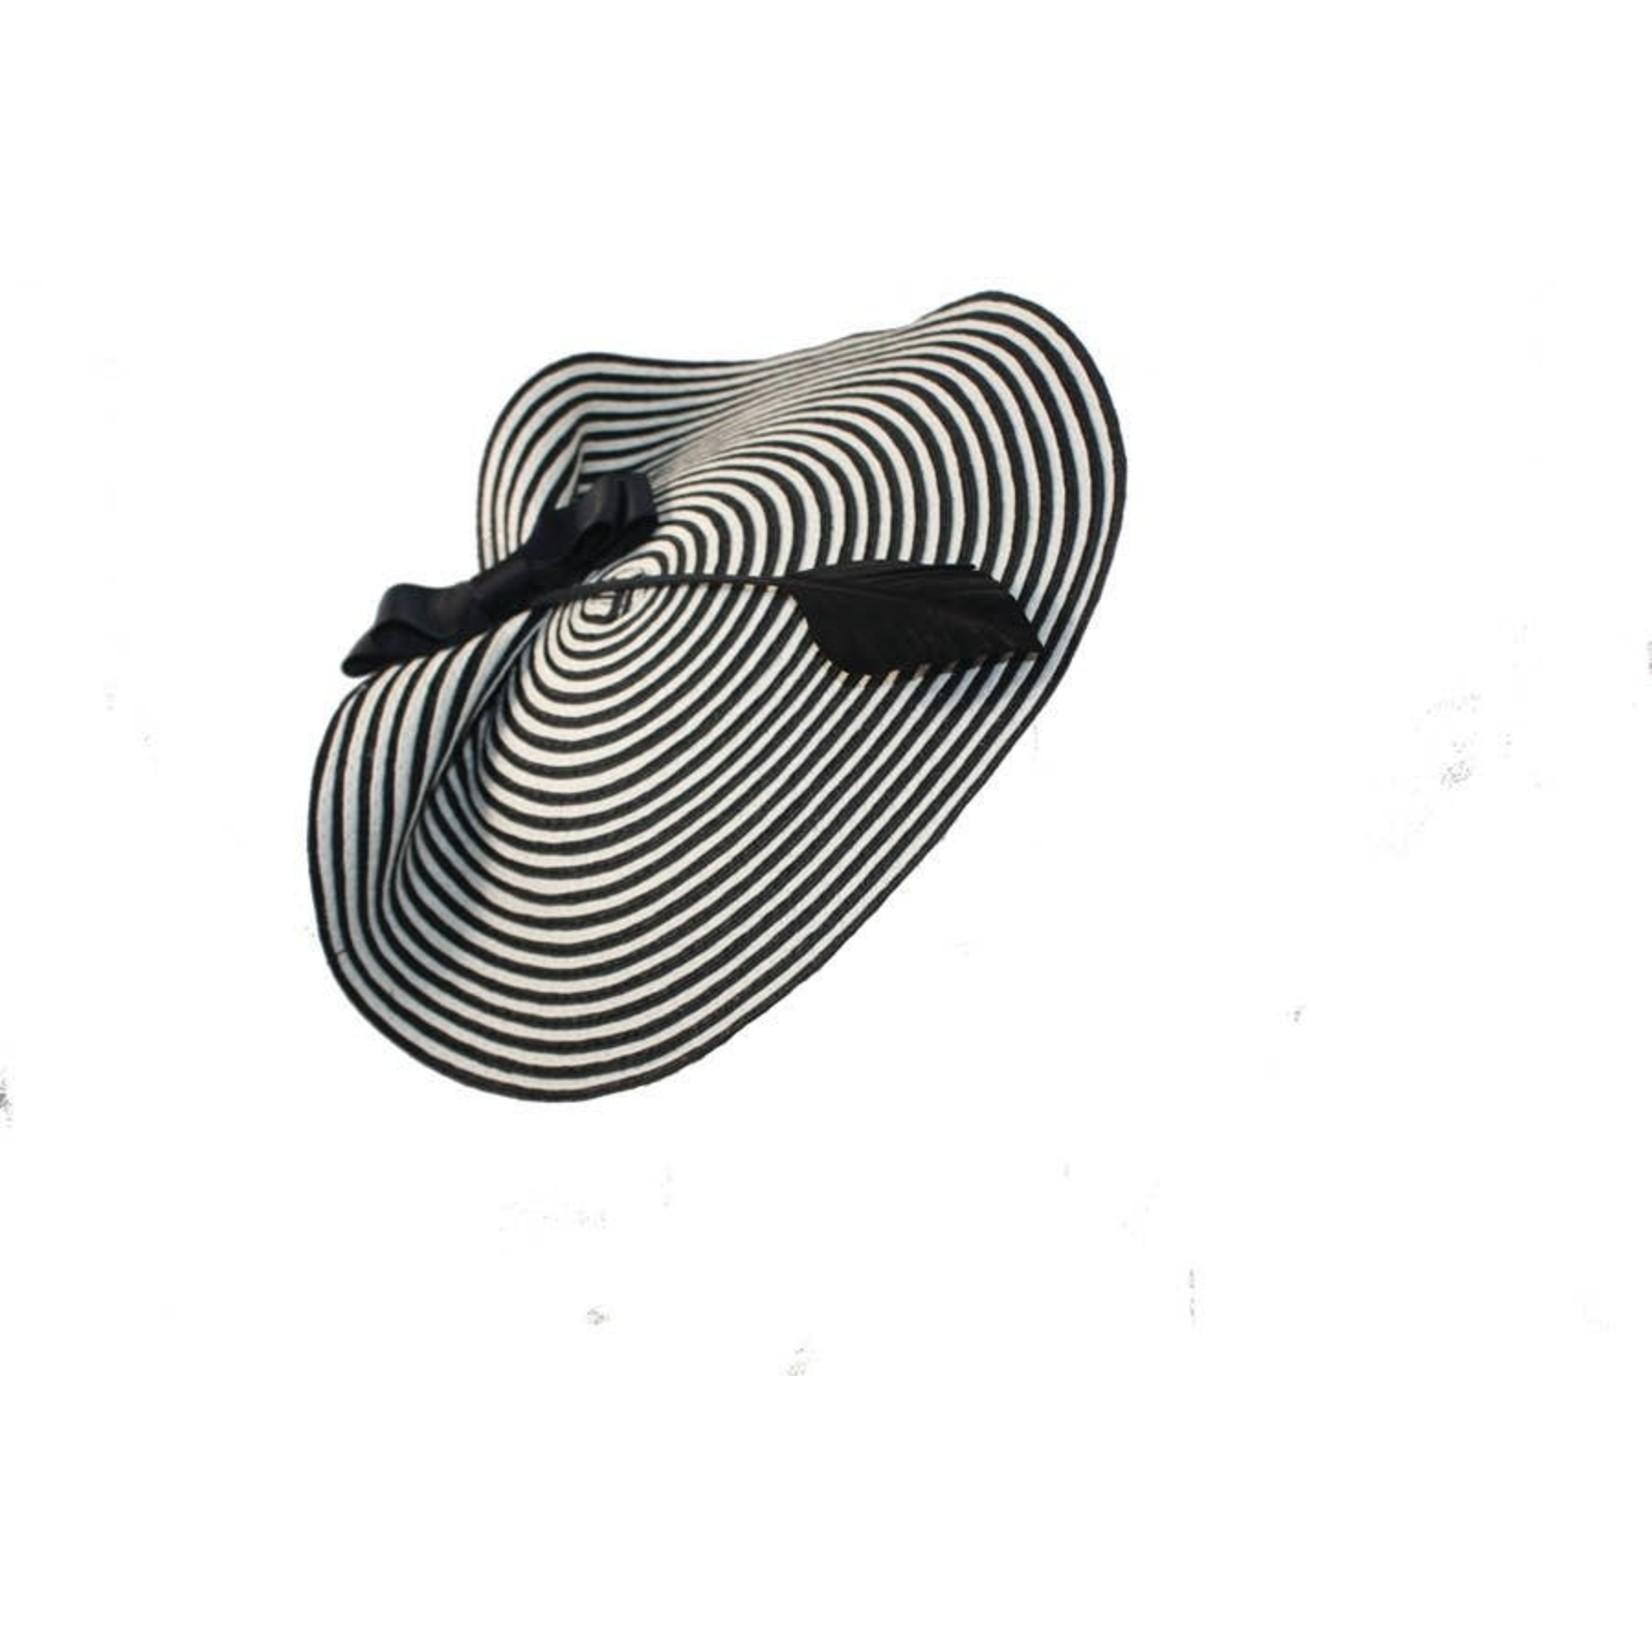 Jeanne Simmons Fascinator Headband of Blk & Wht Stripe Paperbraid Disc